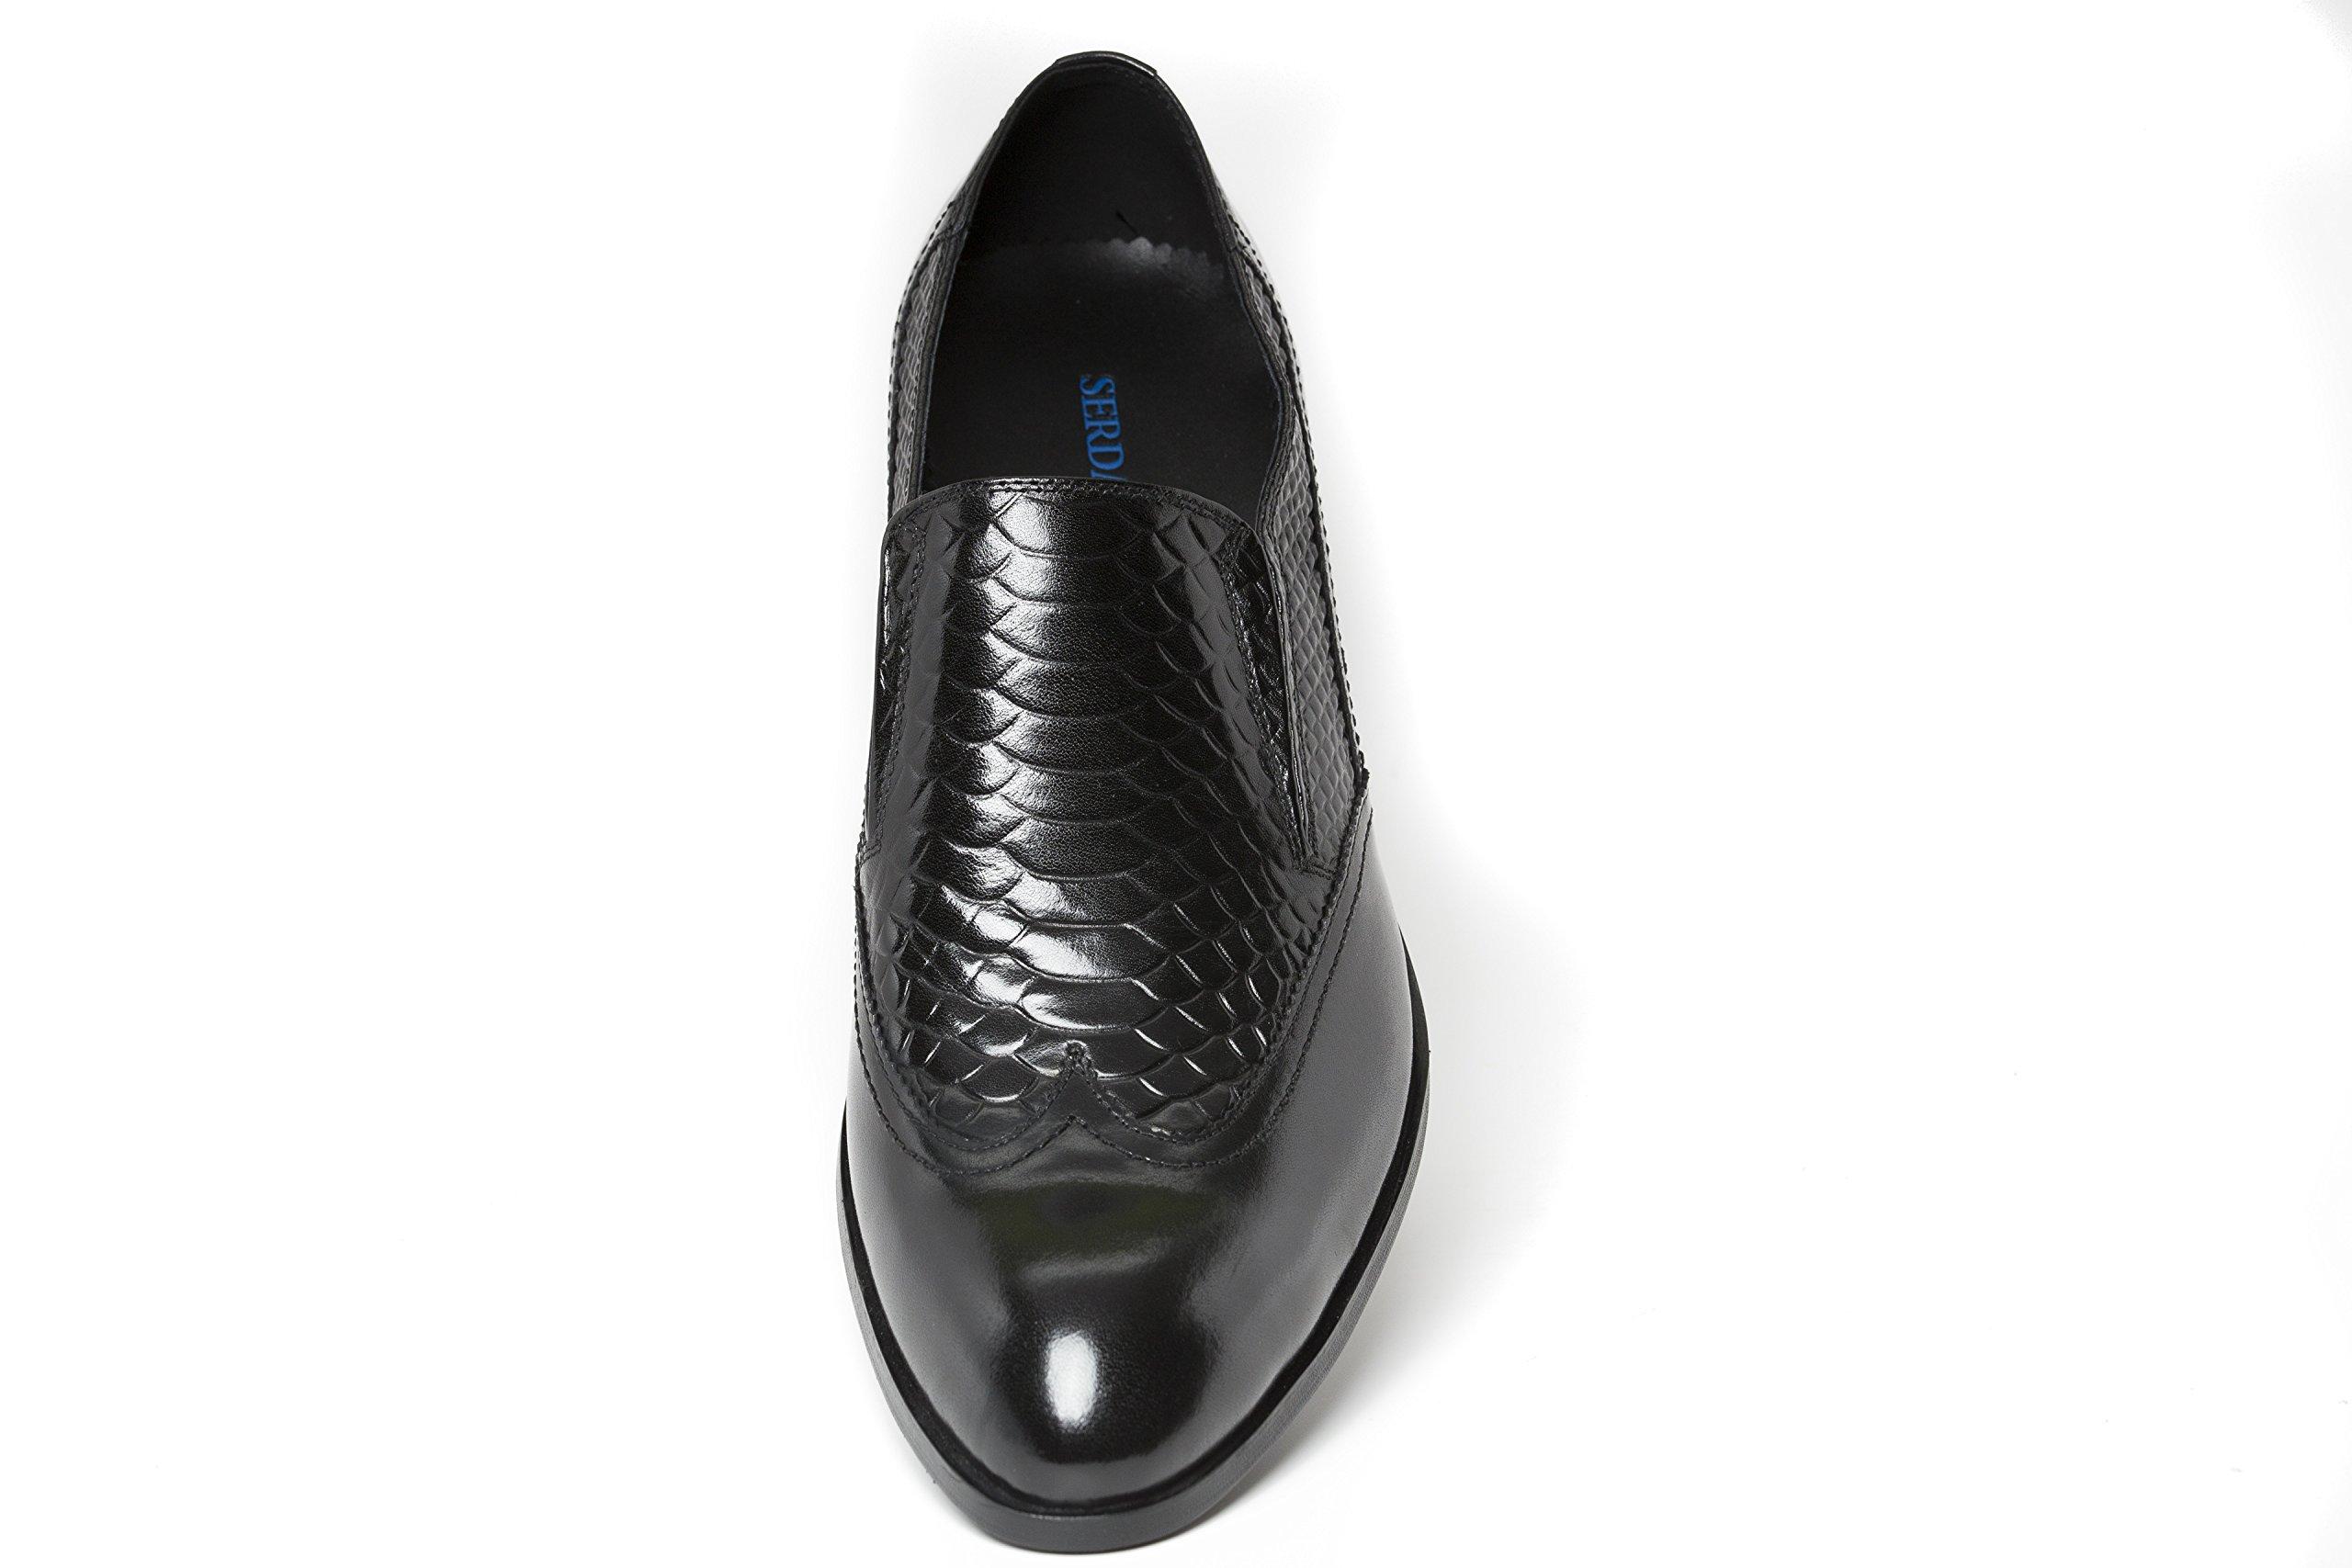 Aquila (Liam Michael Family of Shoes) (9, Black) by Liam Michael Shoes